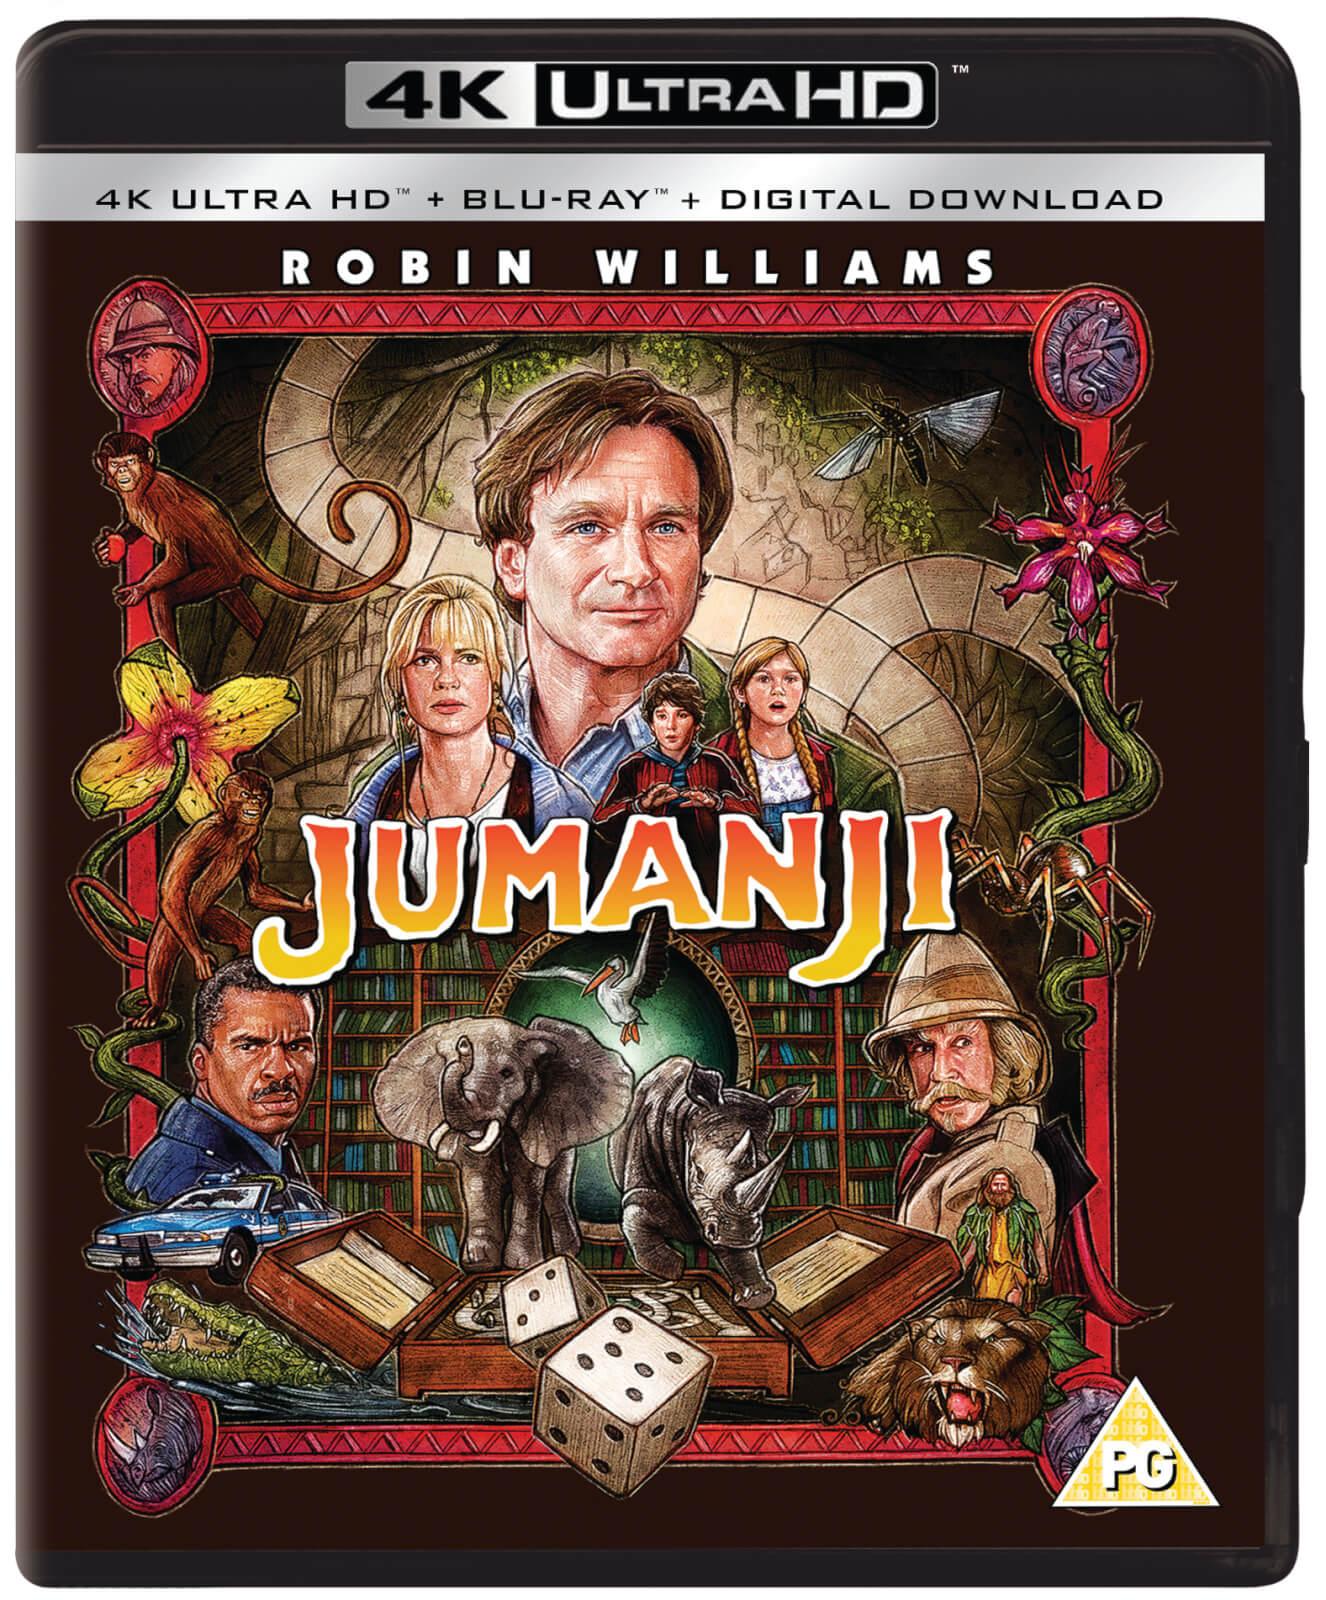 Jumanji (1995) - 4K Ultra HD Blu-ray   Zavvi.de